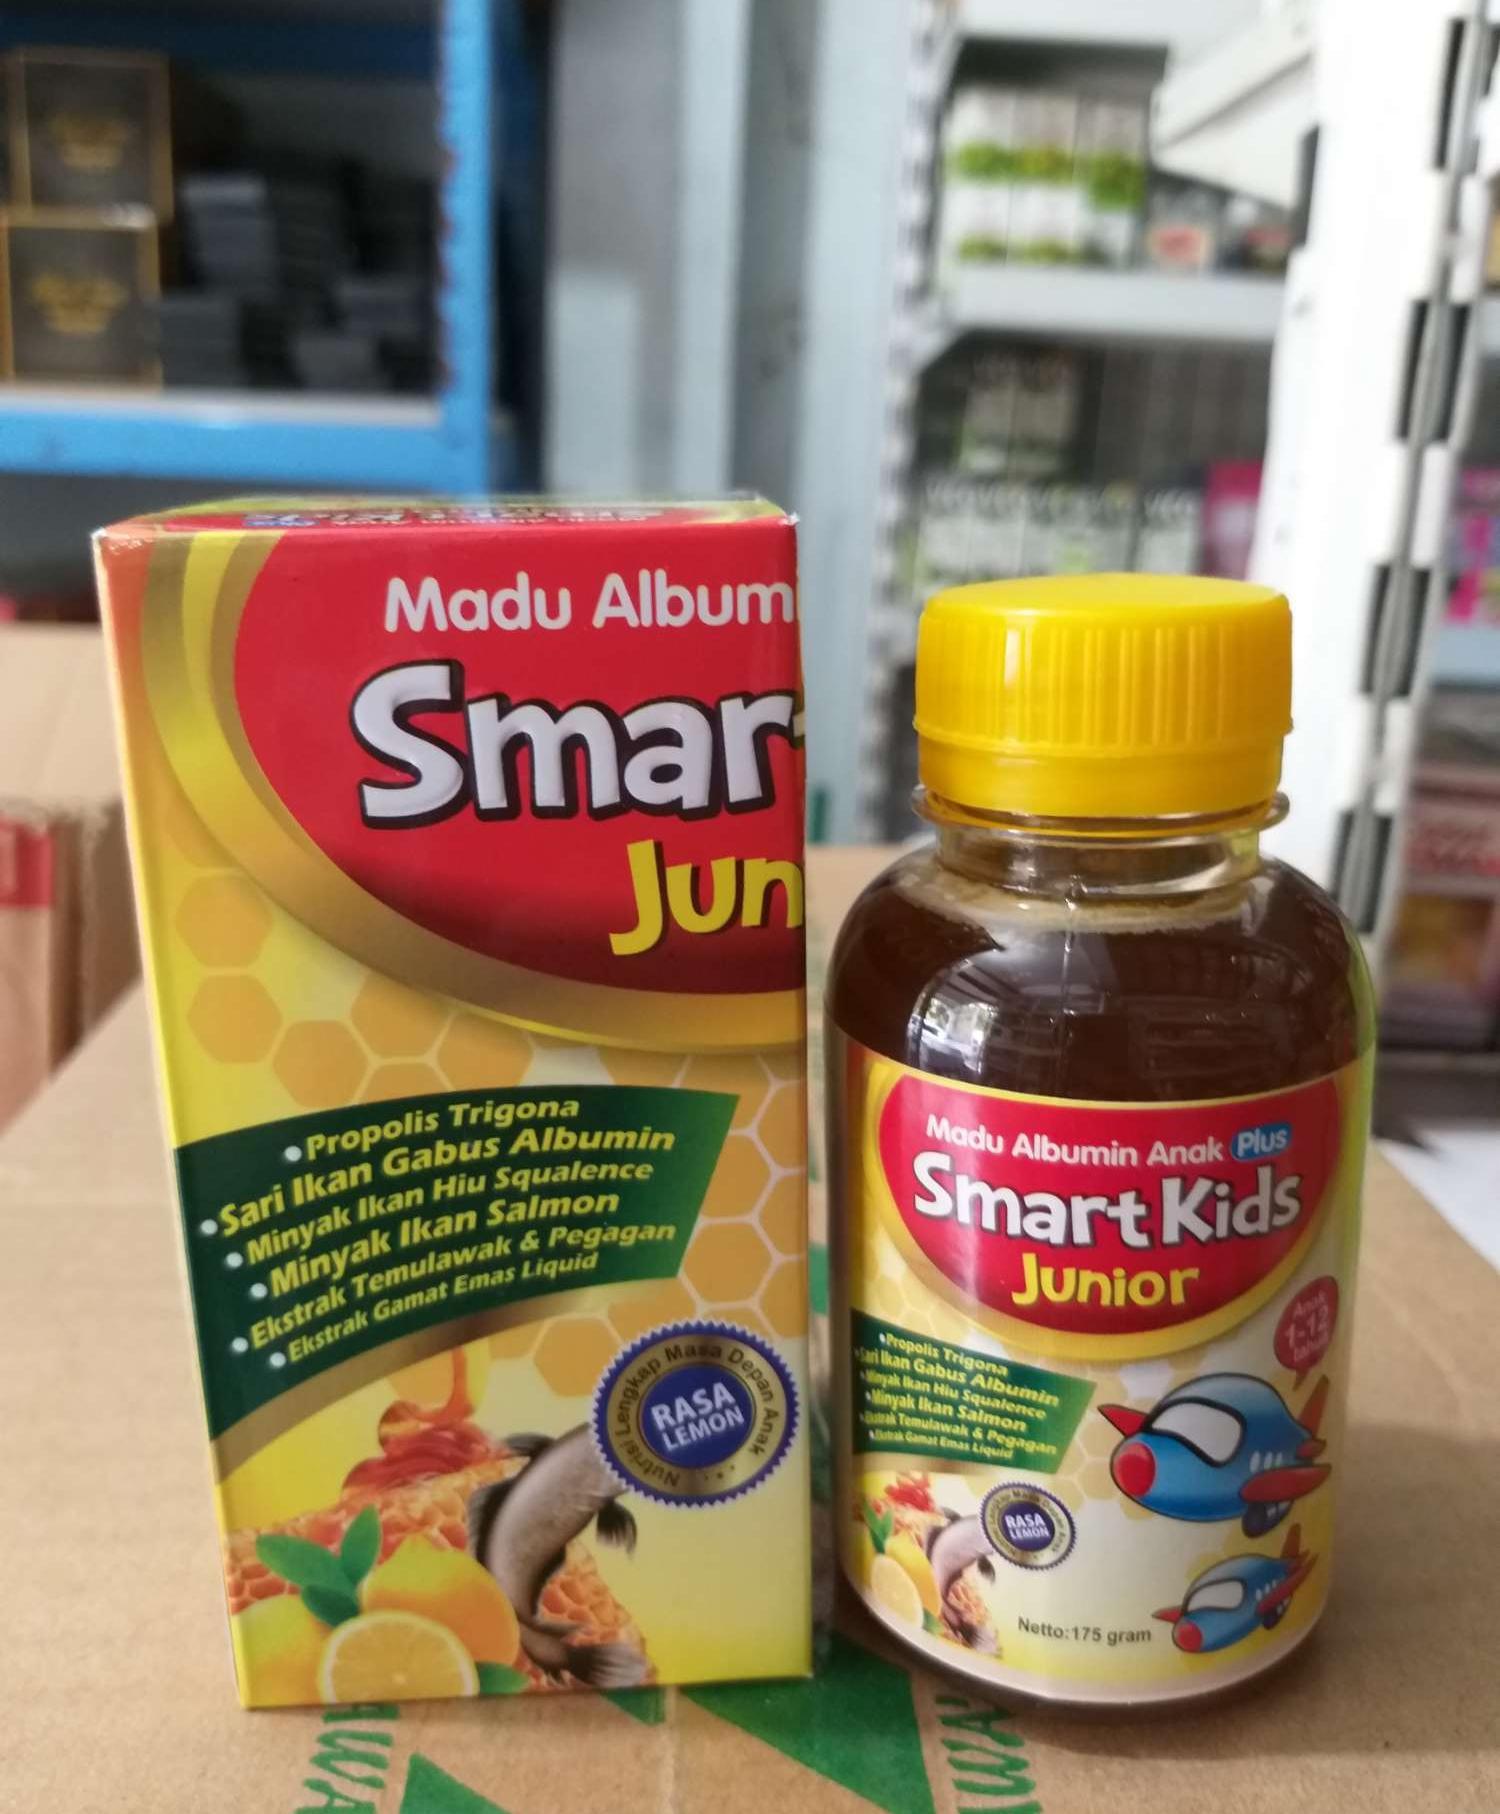 Buy Sell Cheapest Madu Albumin Smart Best Quality Product Deals Vitabumin Anak Plus Minyak Ikan Asli Kids Penambah Nafsu Makan Kecerdasan Otak